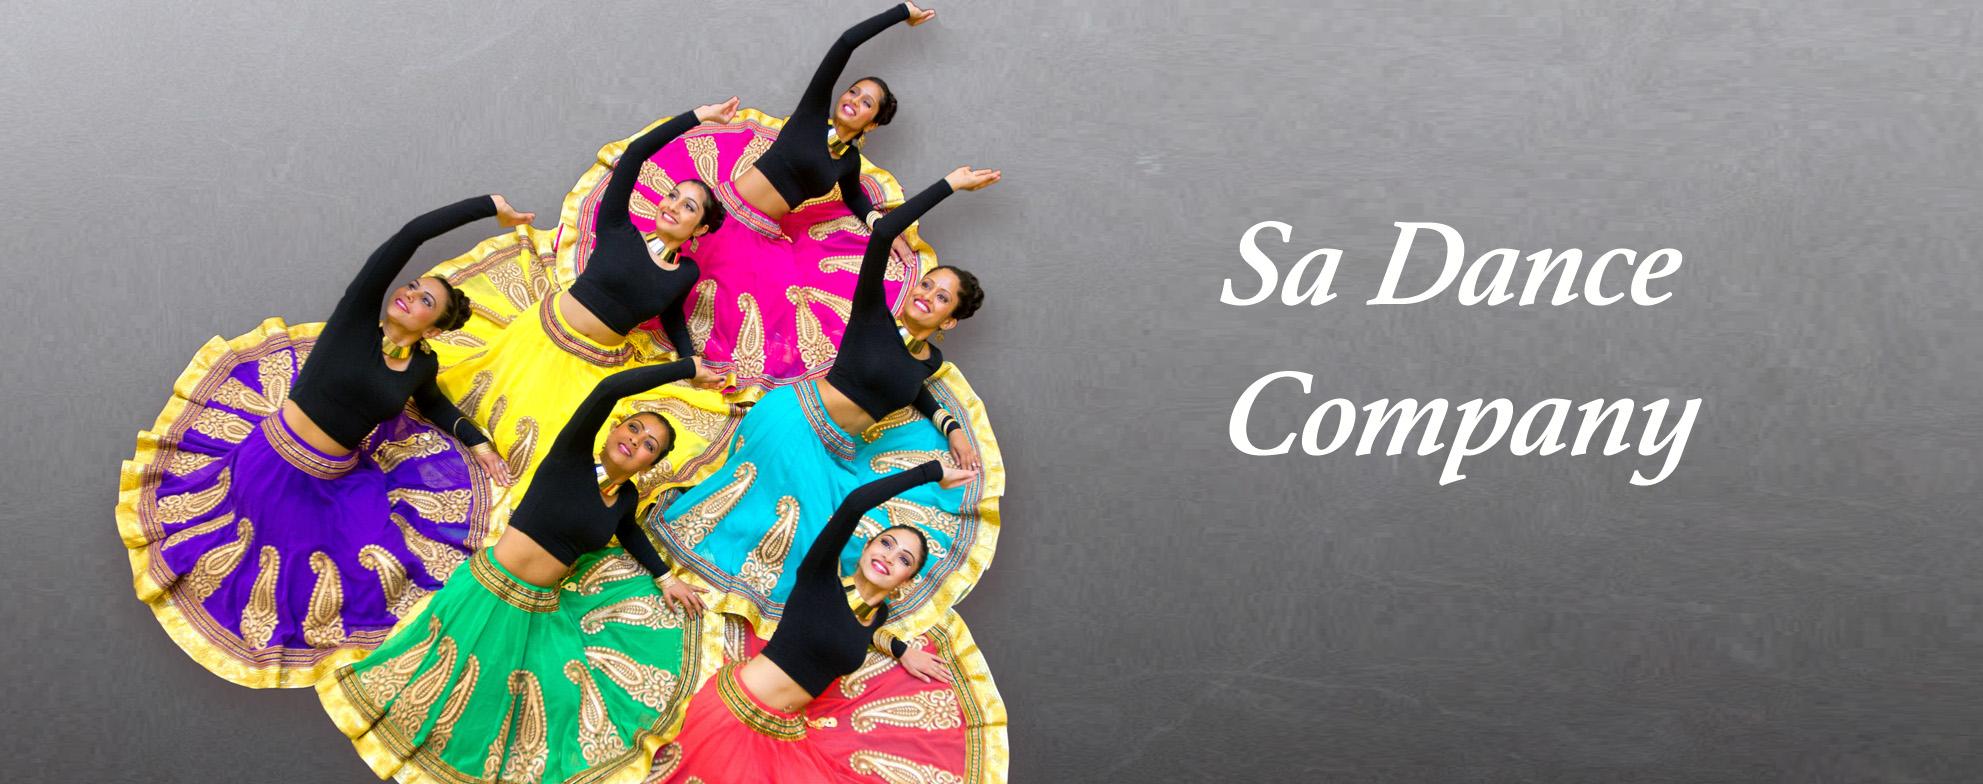 Sa Dance Company by Payal Kadakia